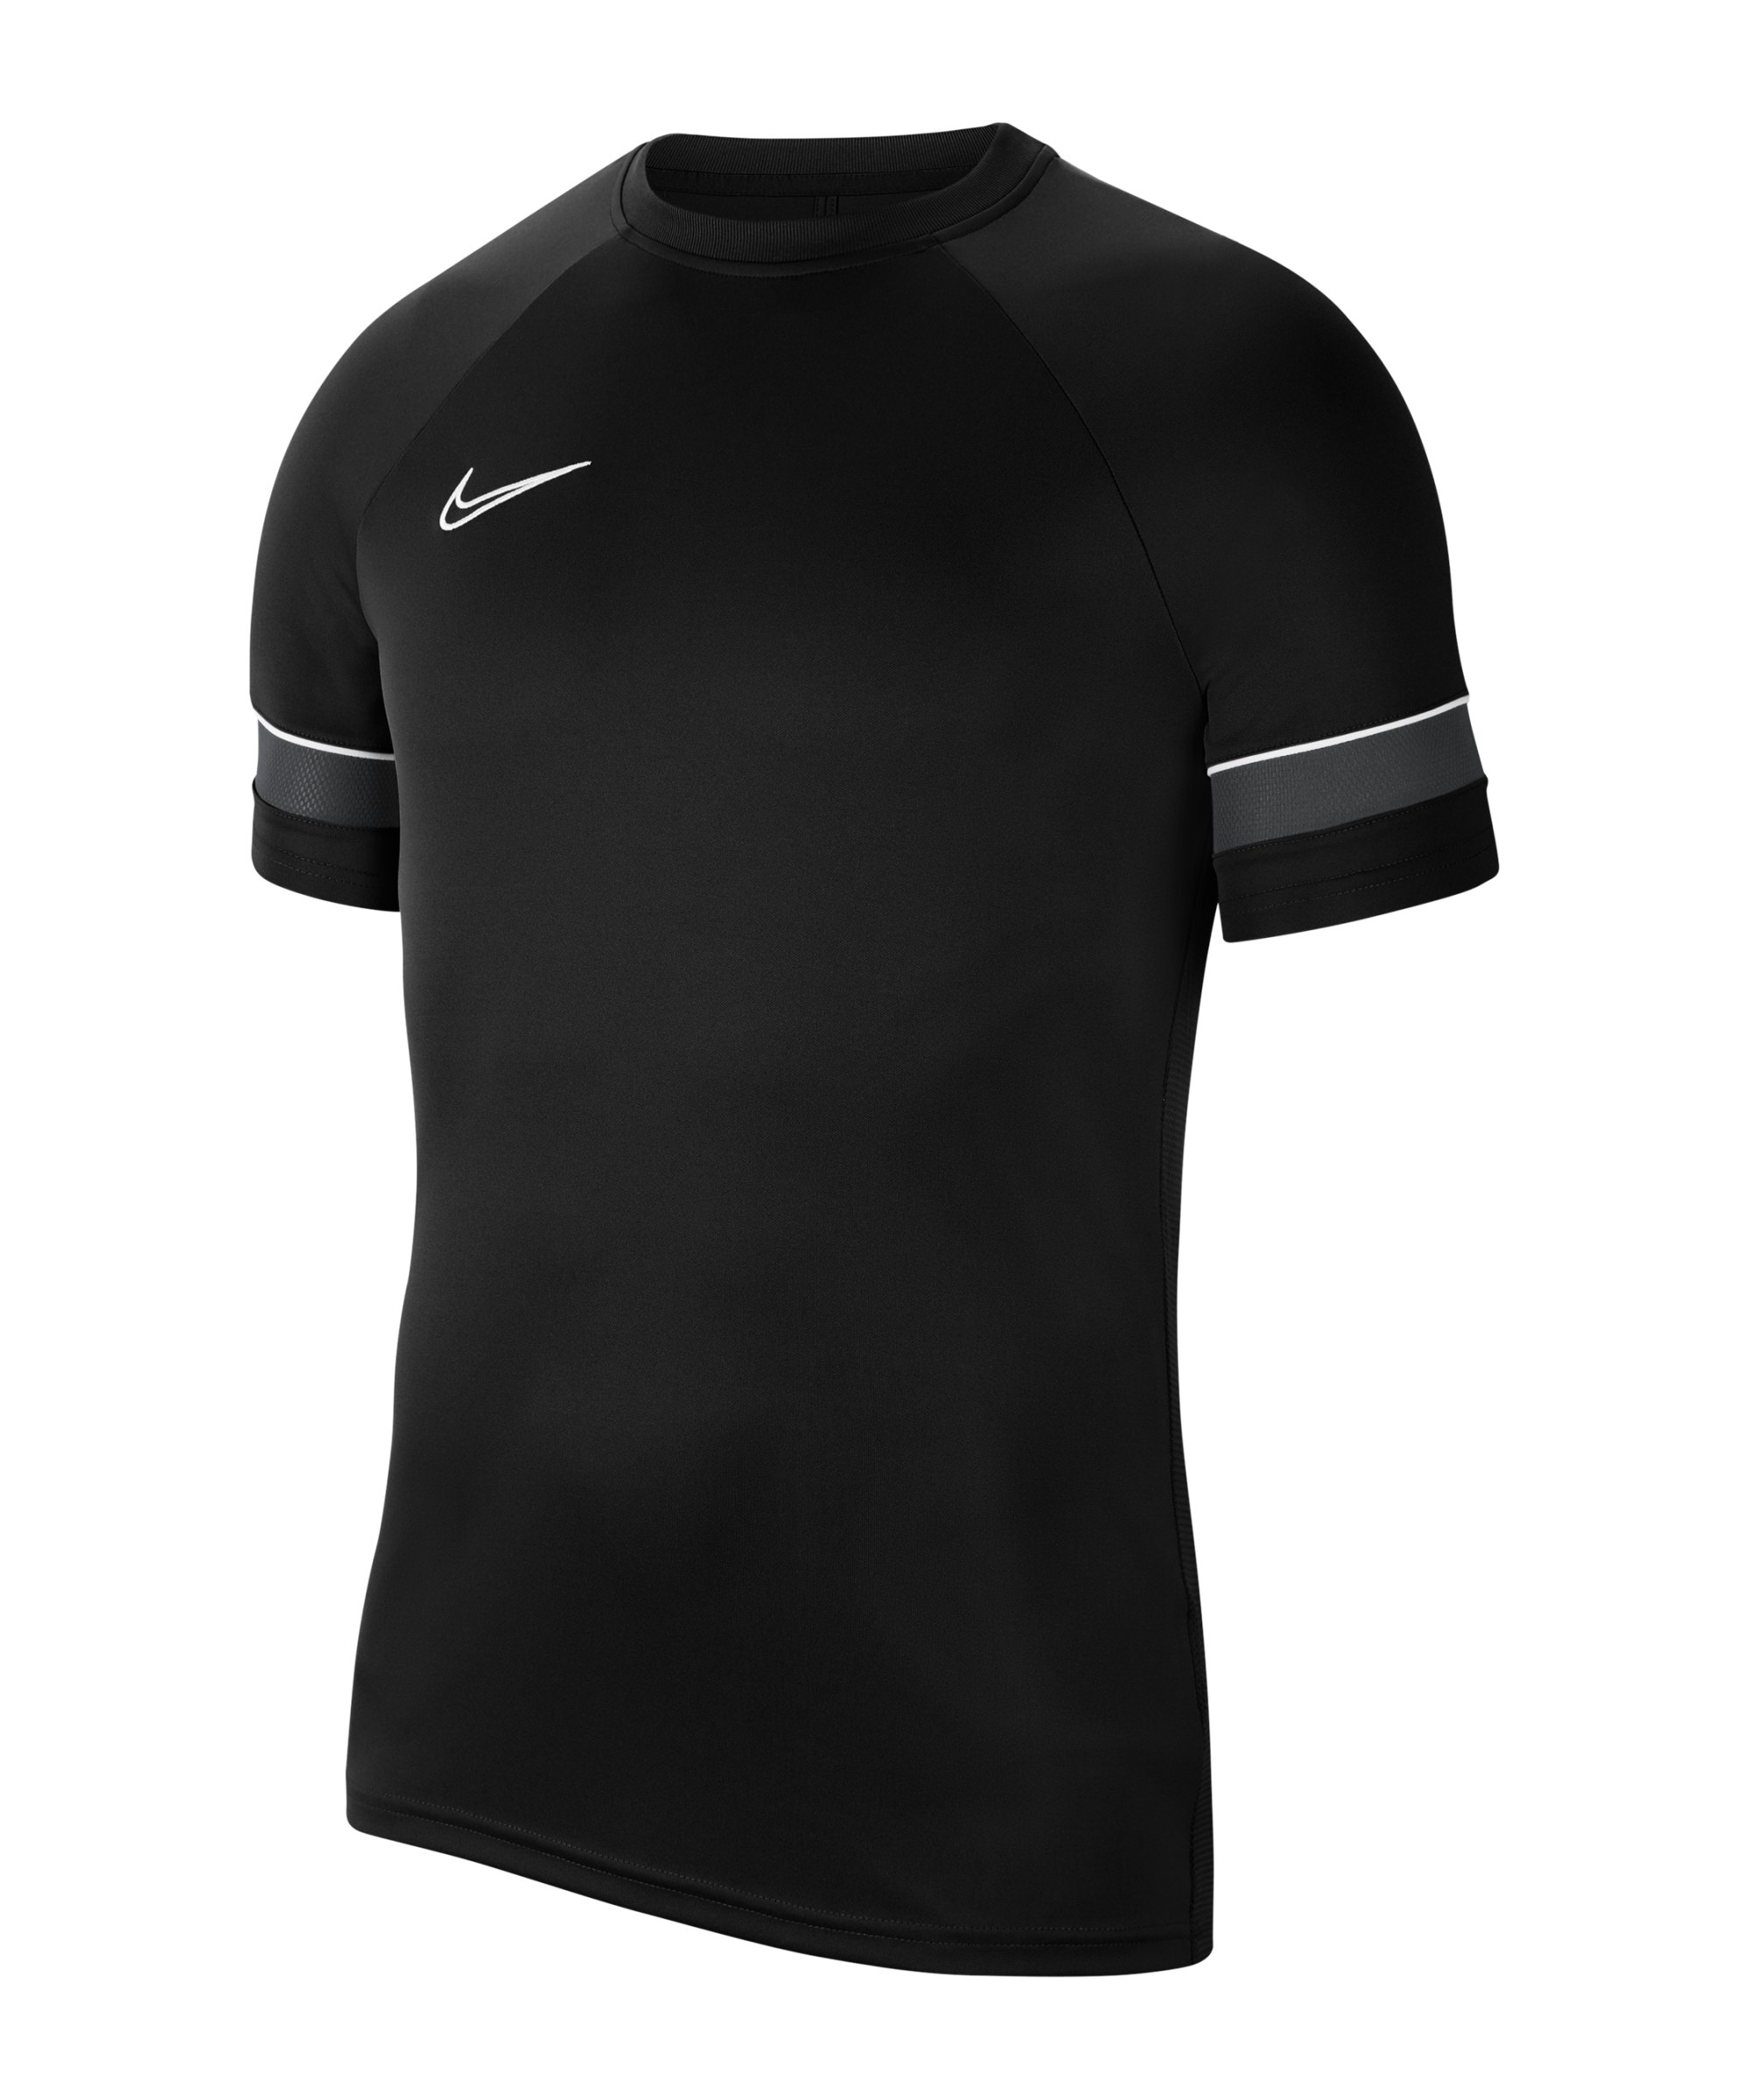 Nike Academy 21 T-Shirt Schwarz Weiss F014 - schwarz